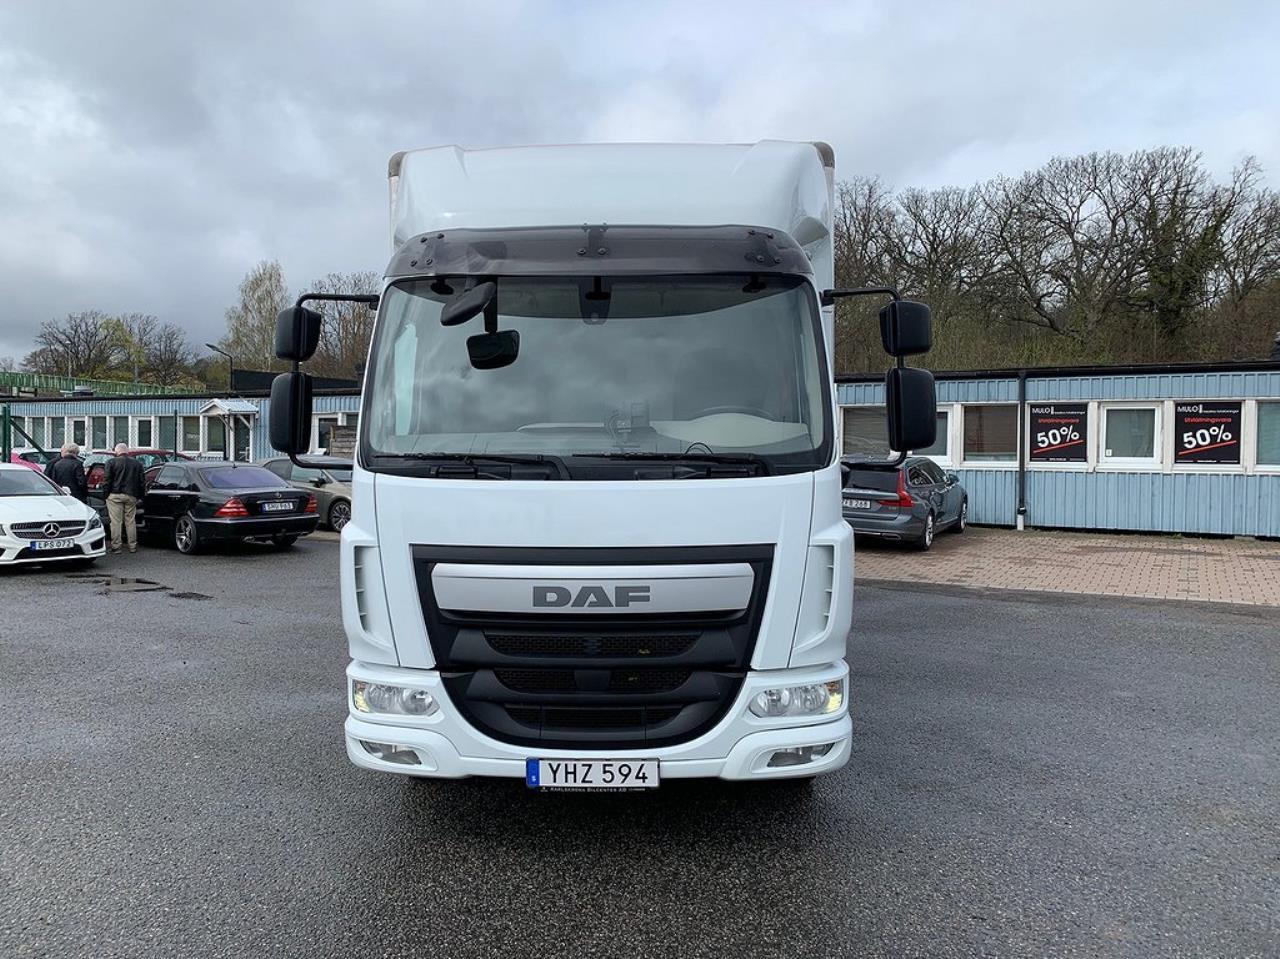 DAF LF 210 Fa Skåp Euro 6 2017 - Skåp